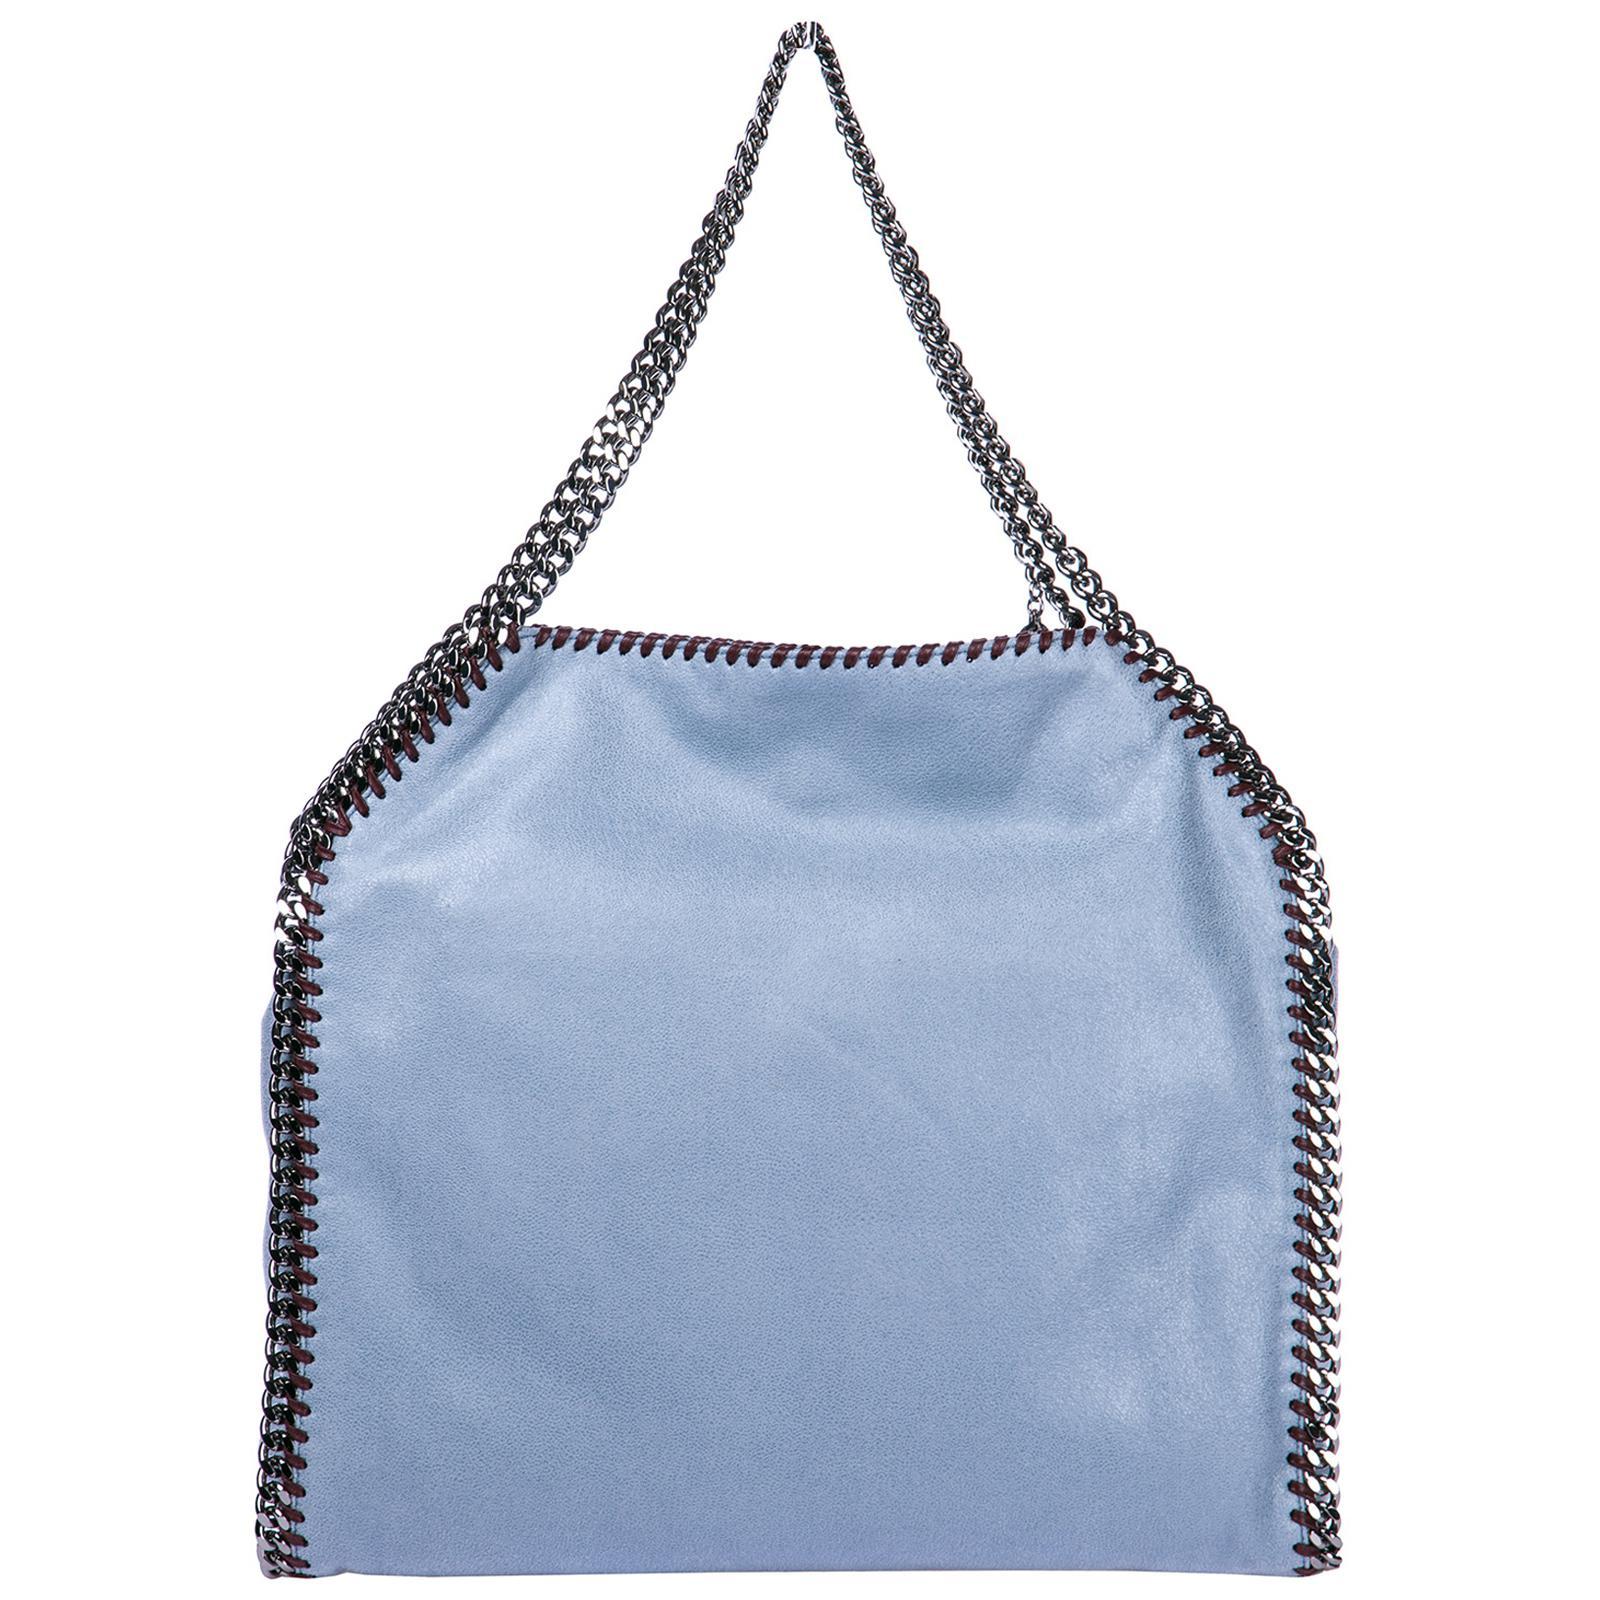 ee1ab1dc5cdf Stella McCartney - Blue Shoulder Bag Falabella Small Tote shaggy Deer -  Lyst. View fullscreen